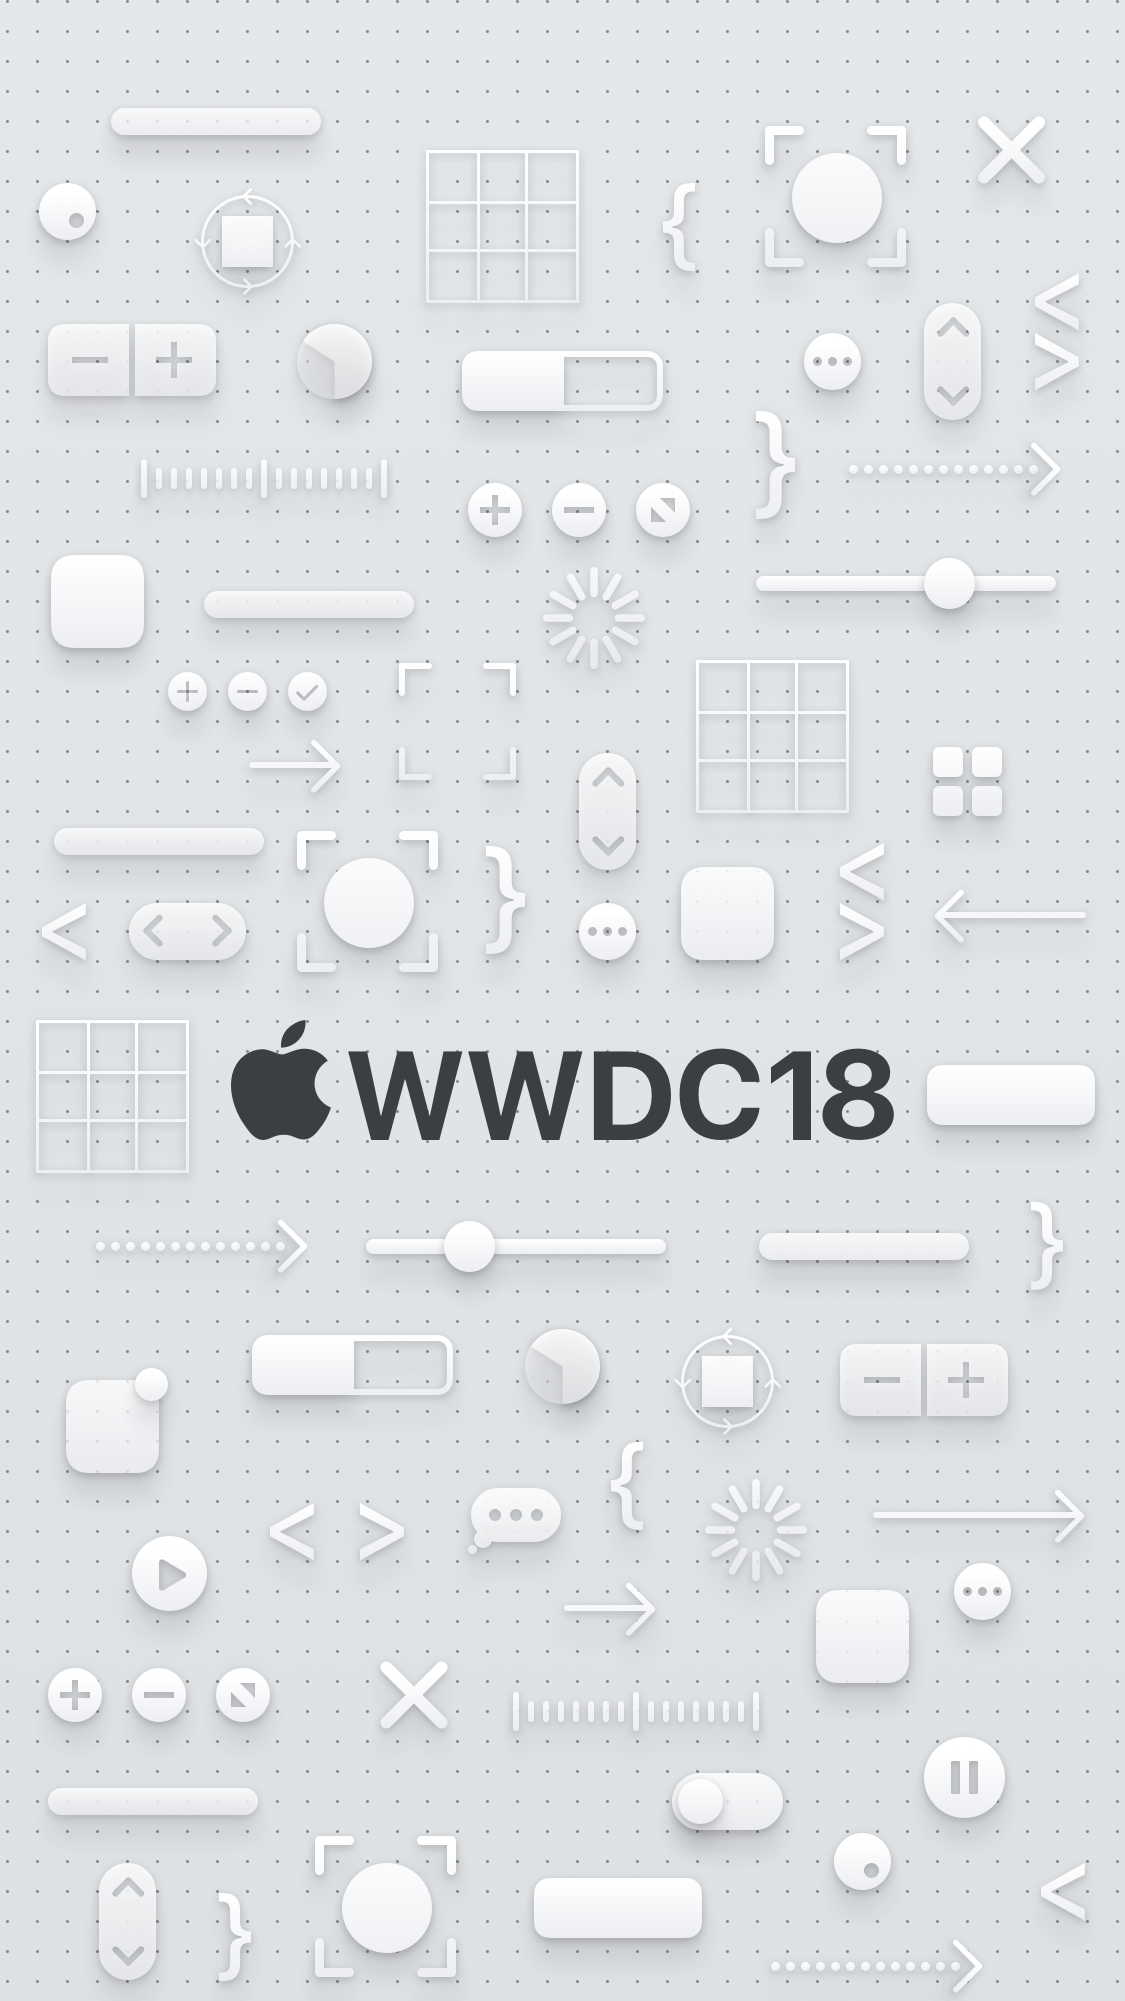 WWDC 2018 wallpaper iPhone 8 dark logo